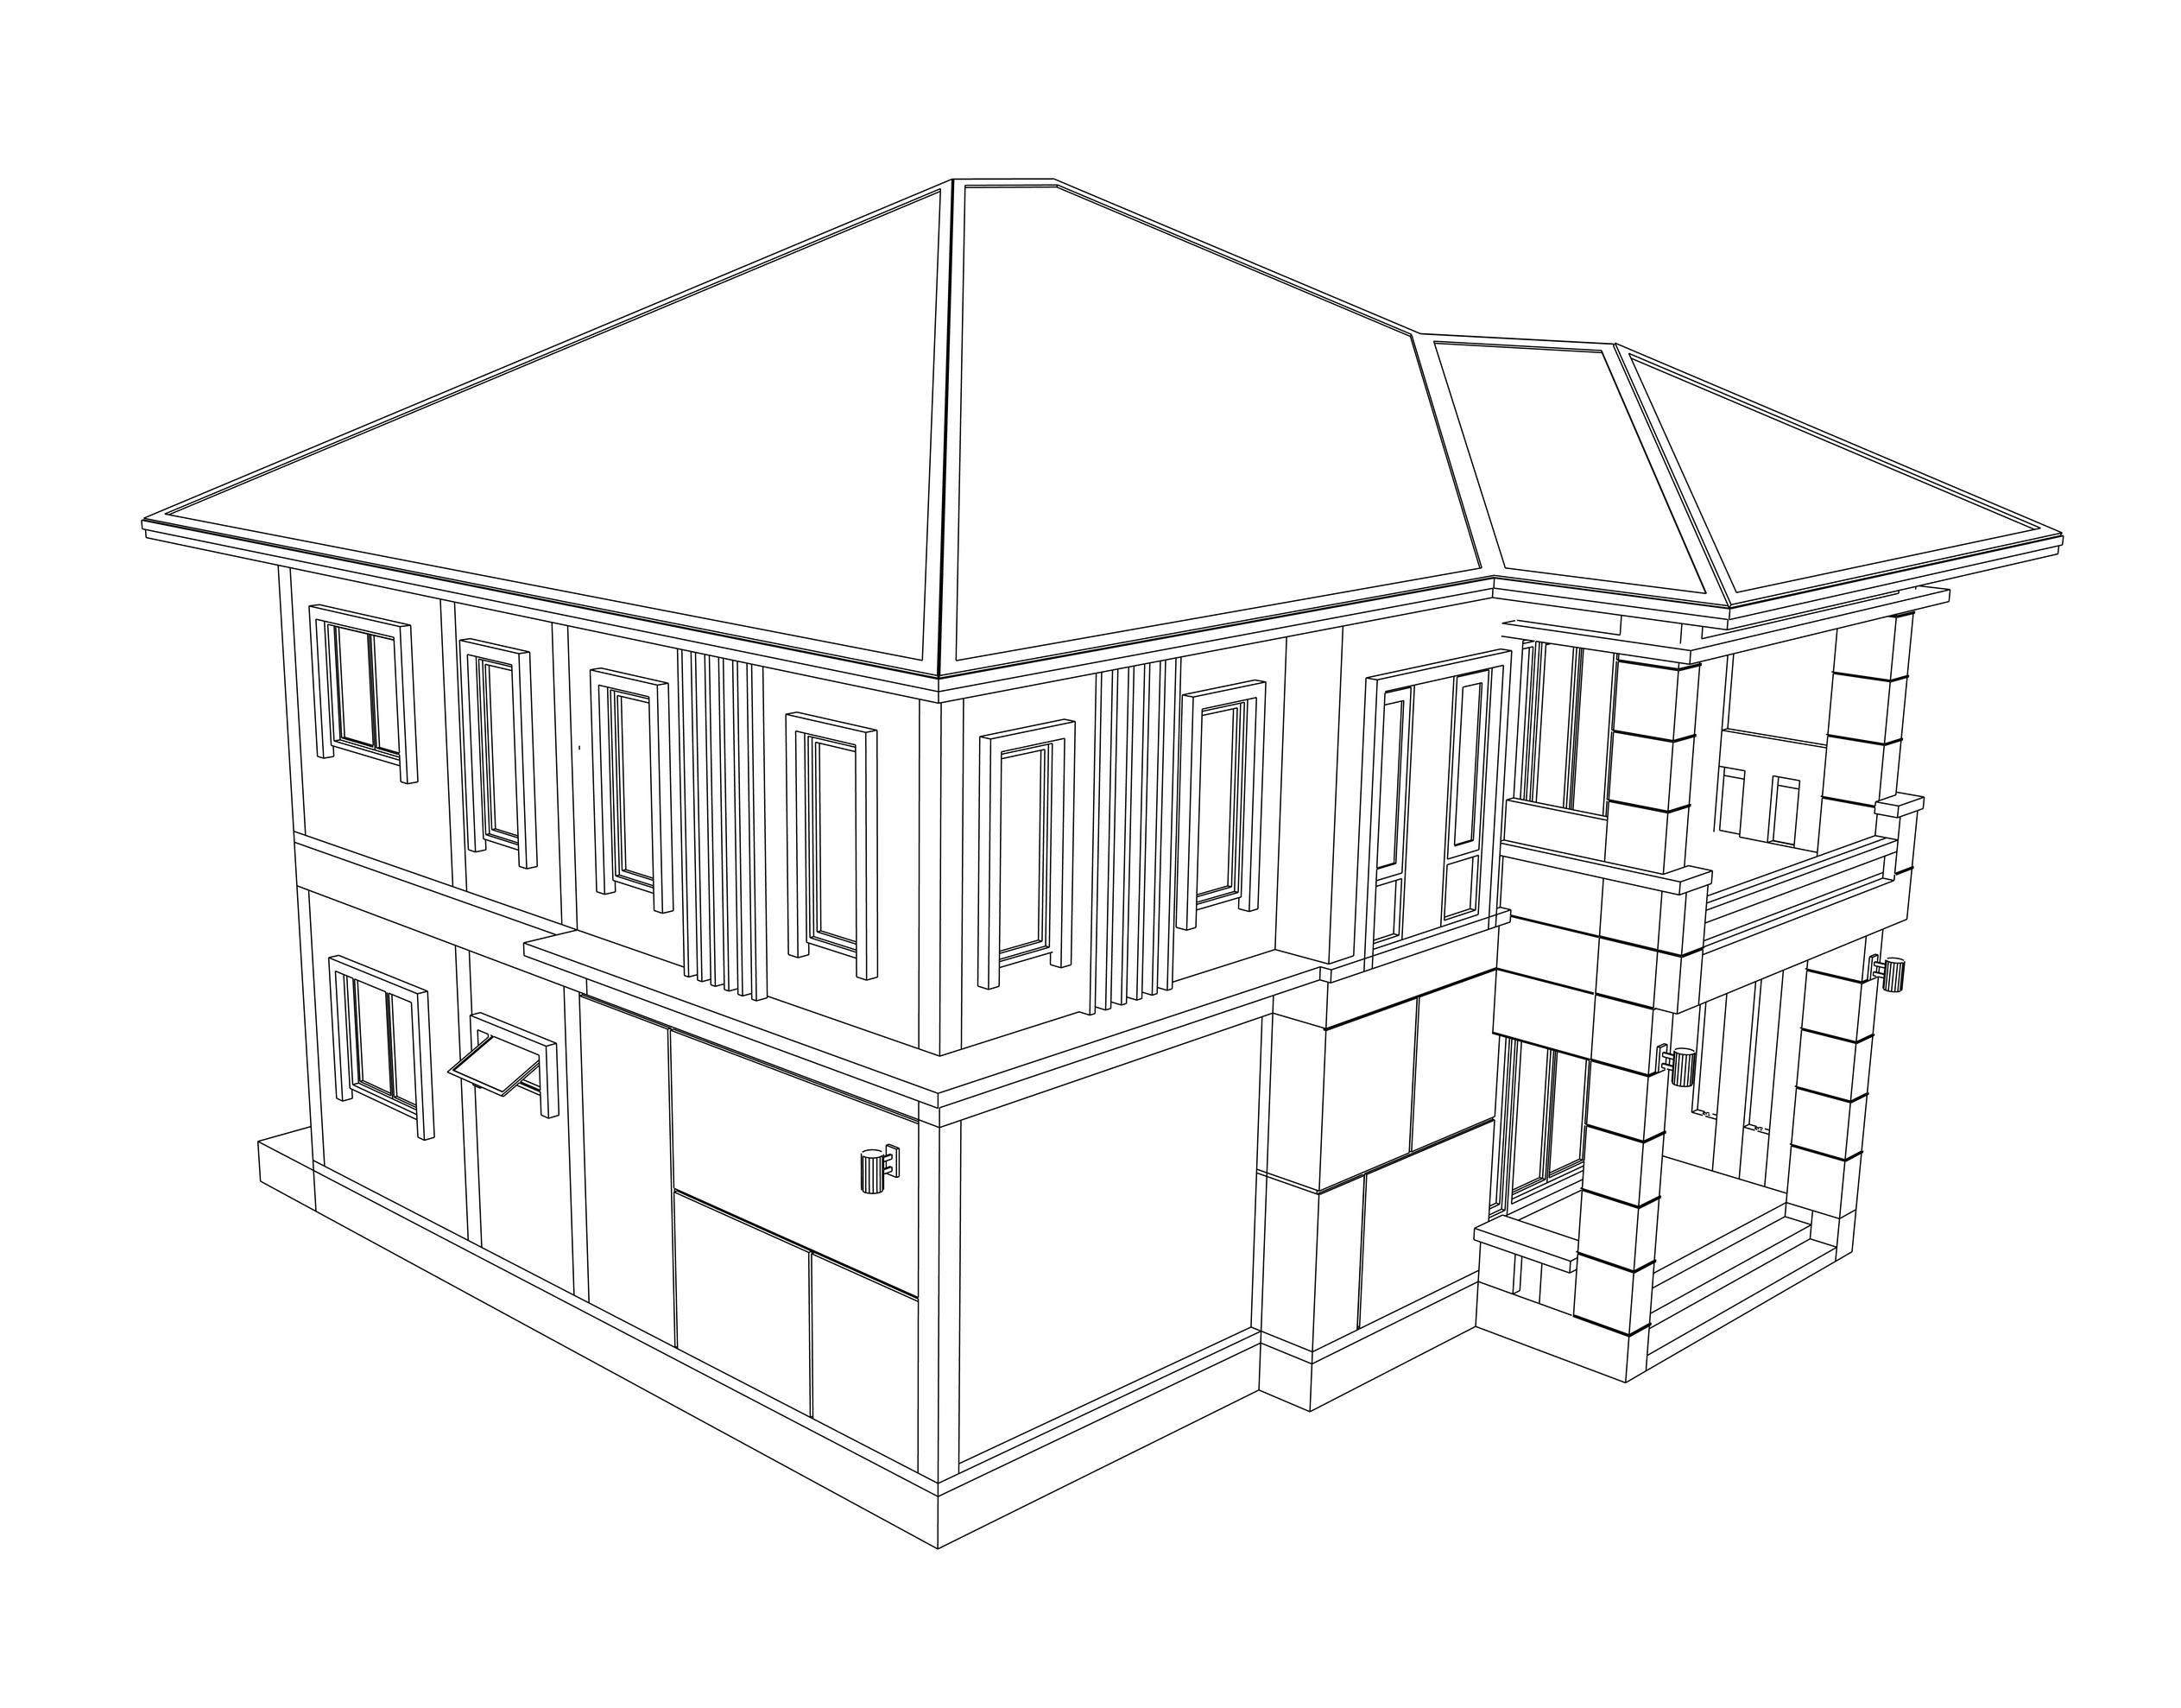 schemat dachu kopertowego